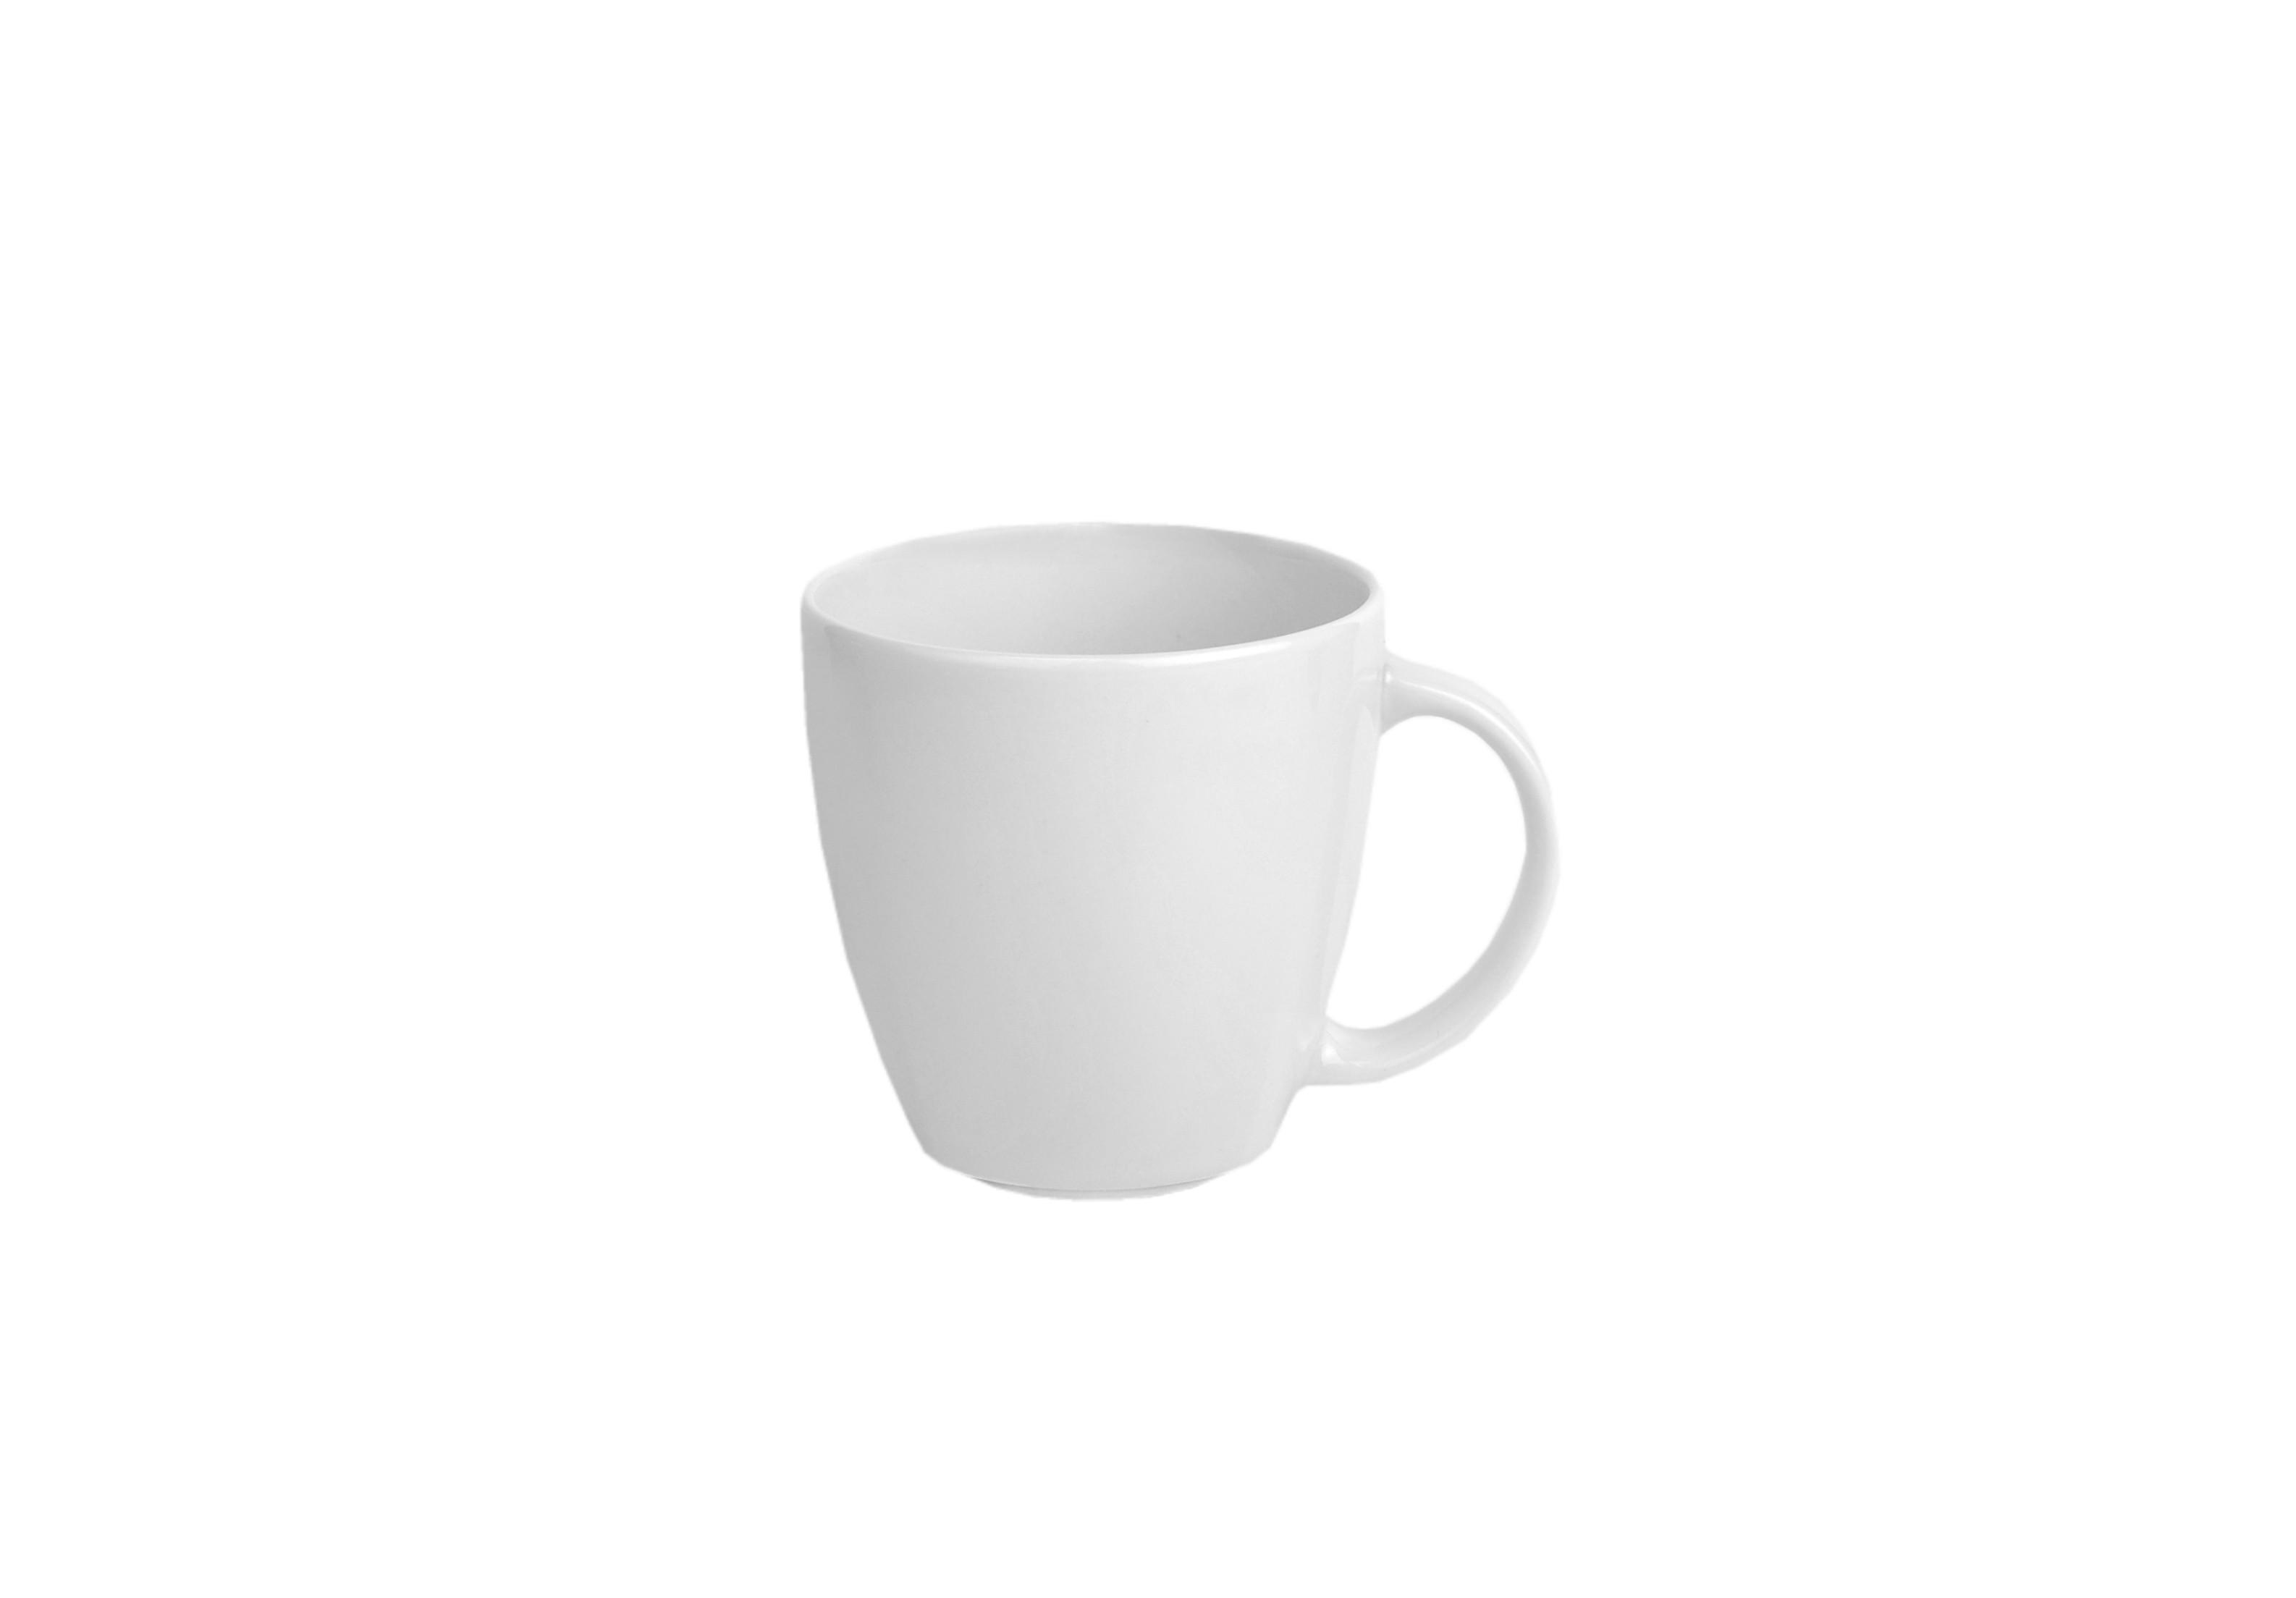 kombiservice classico 30tlg f r 6 personen porzellan kaffeeservice ohne dekor. Black Bedroom Furniture Sets. Home Design Ideas